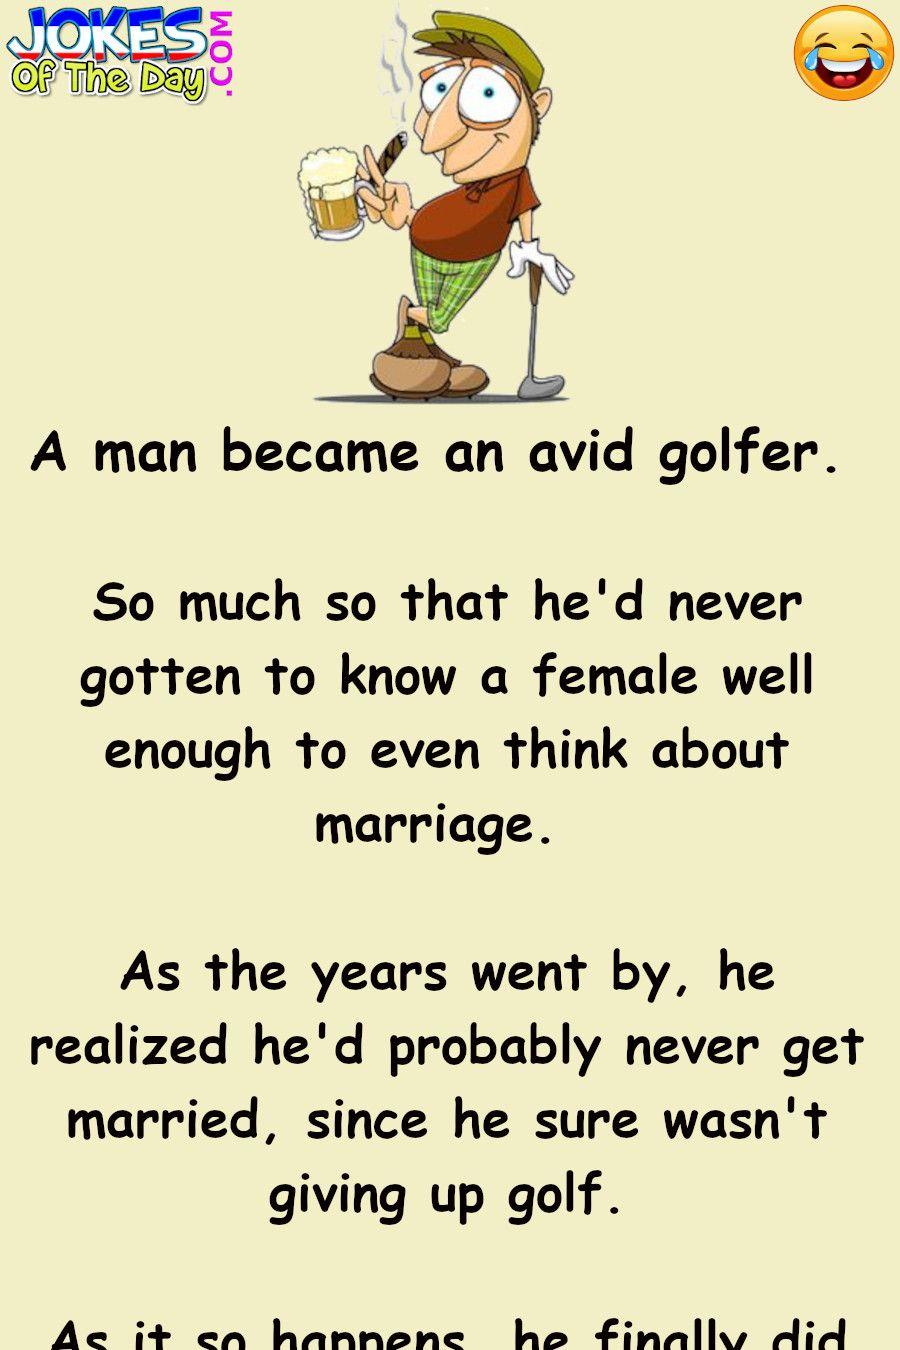 Joke The Golfing Fanatic Meets A Woman In 2020 Funny Prayers Marriage Jokes Funny Relationship Jokes